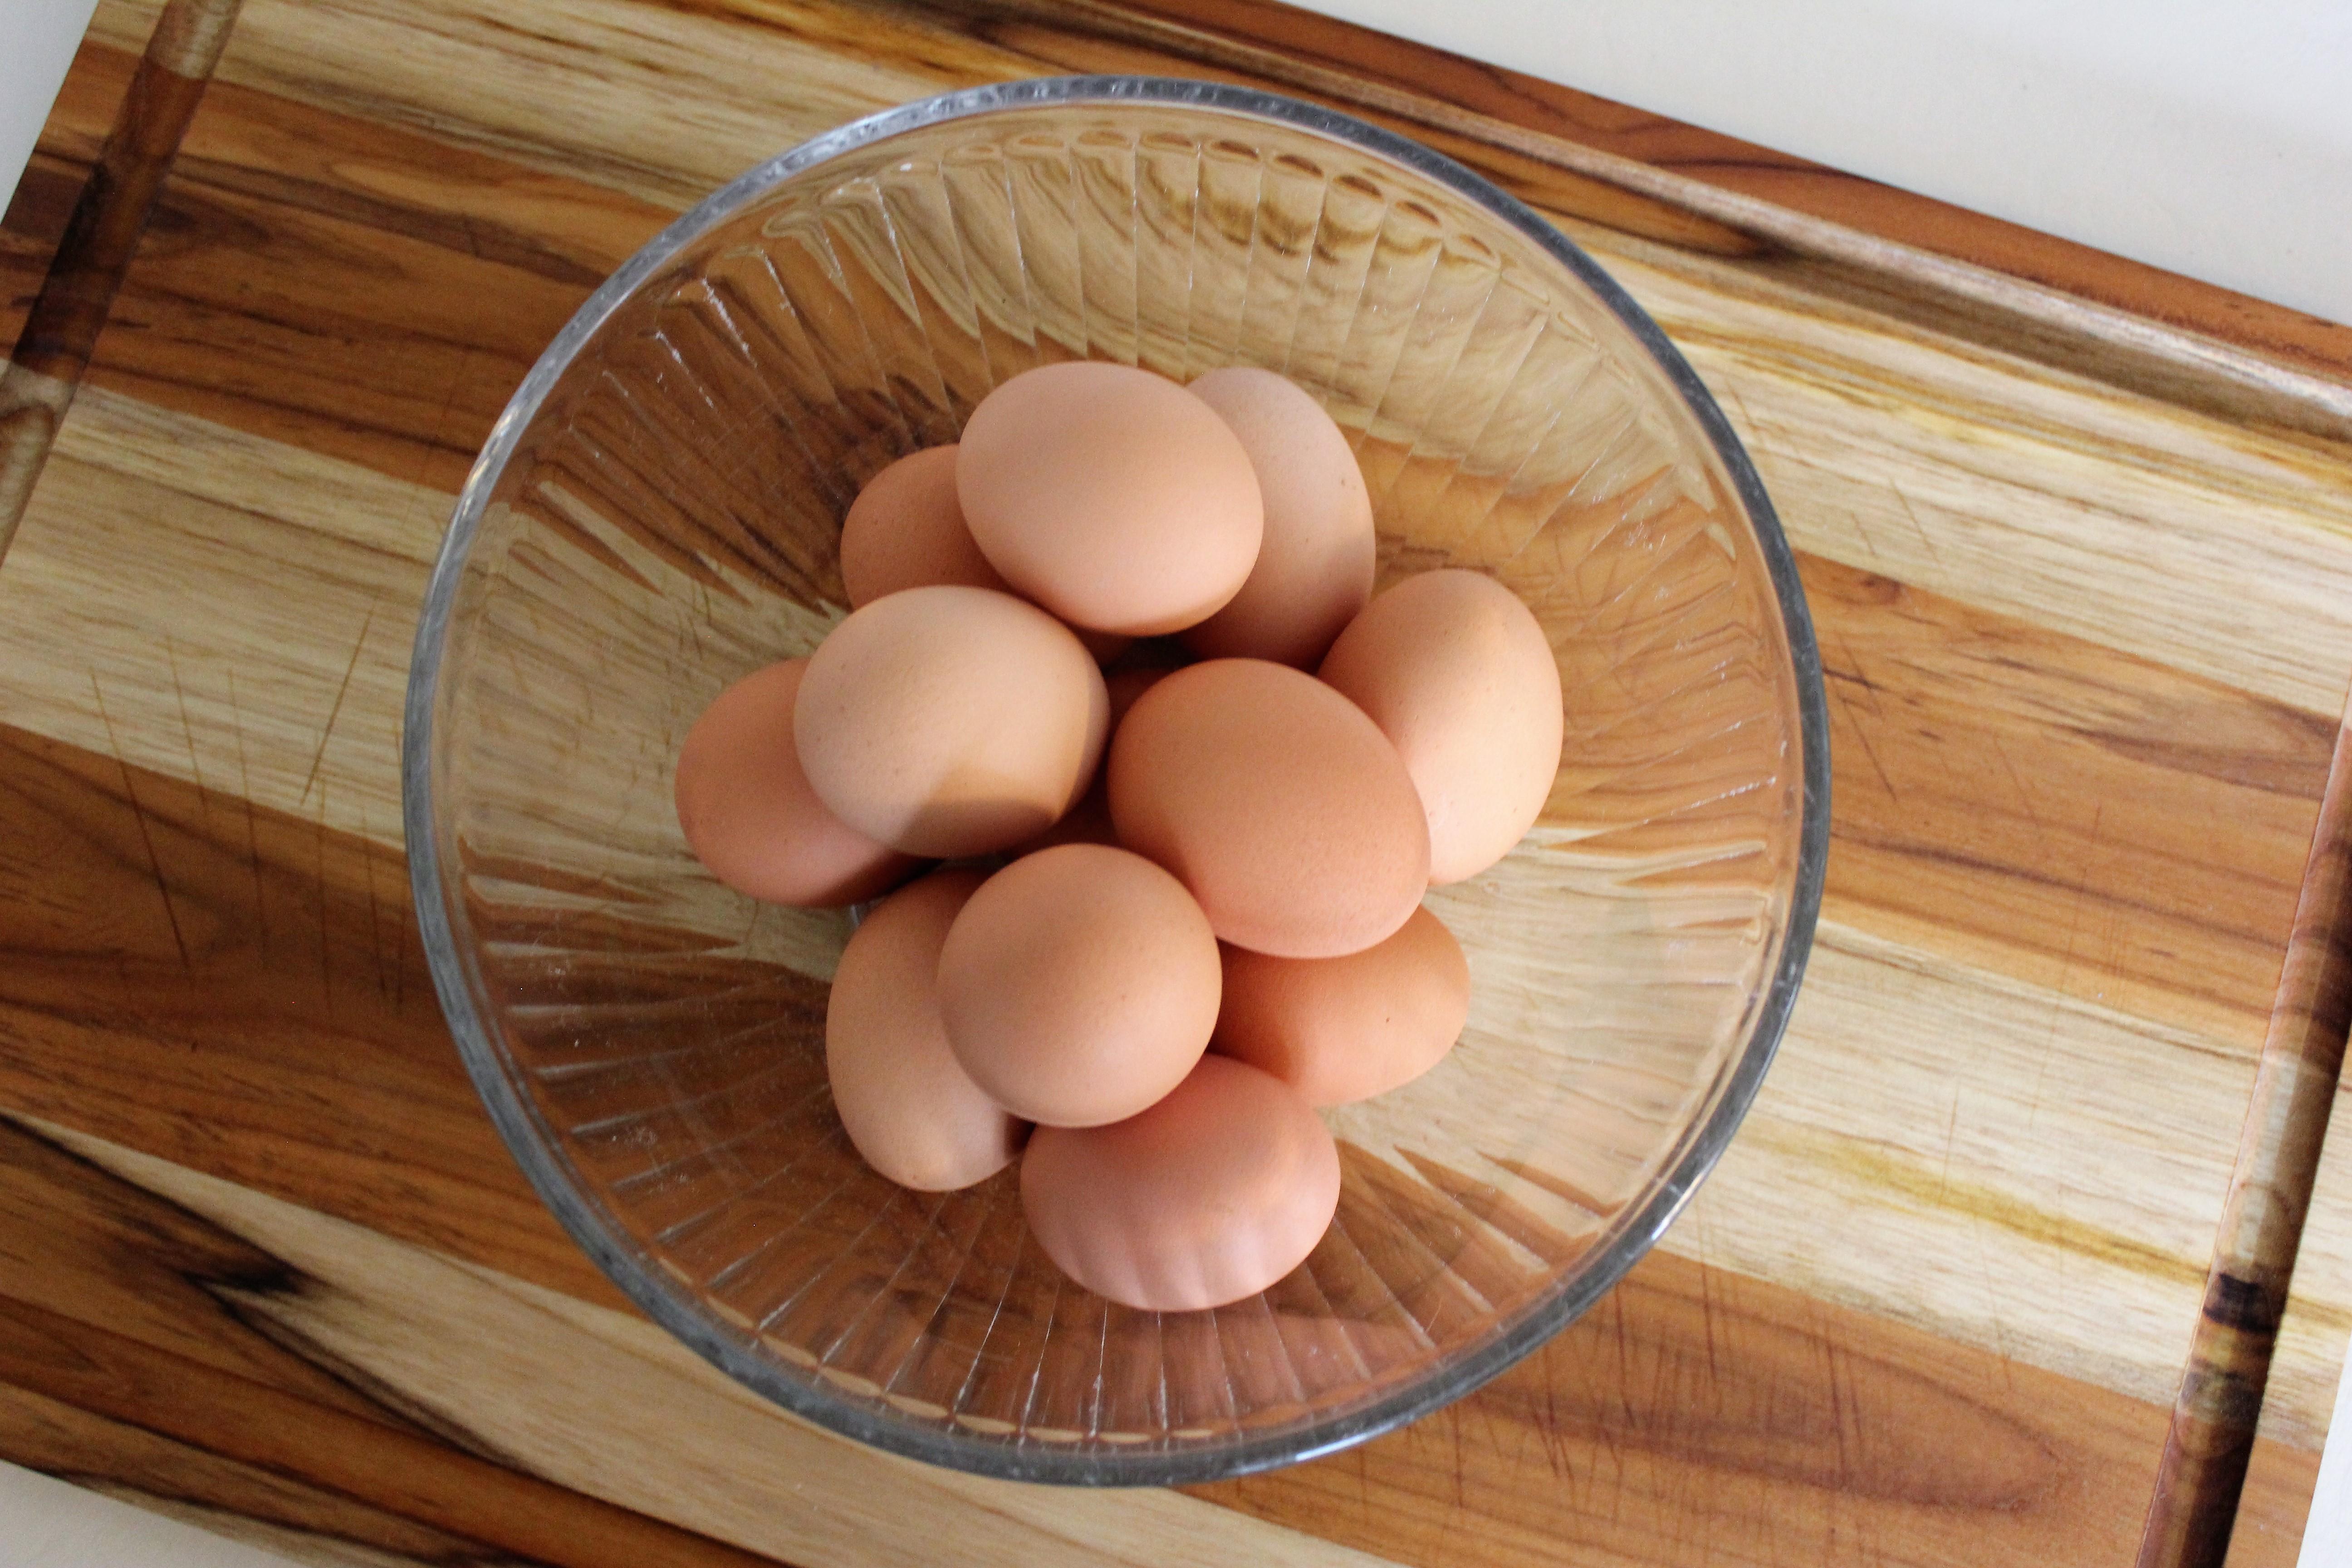 Single Dozen Fall Egg Share